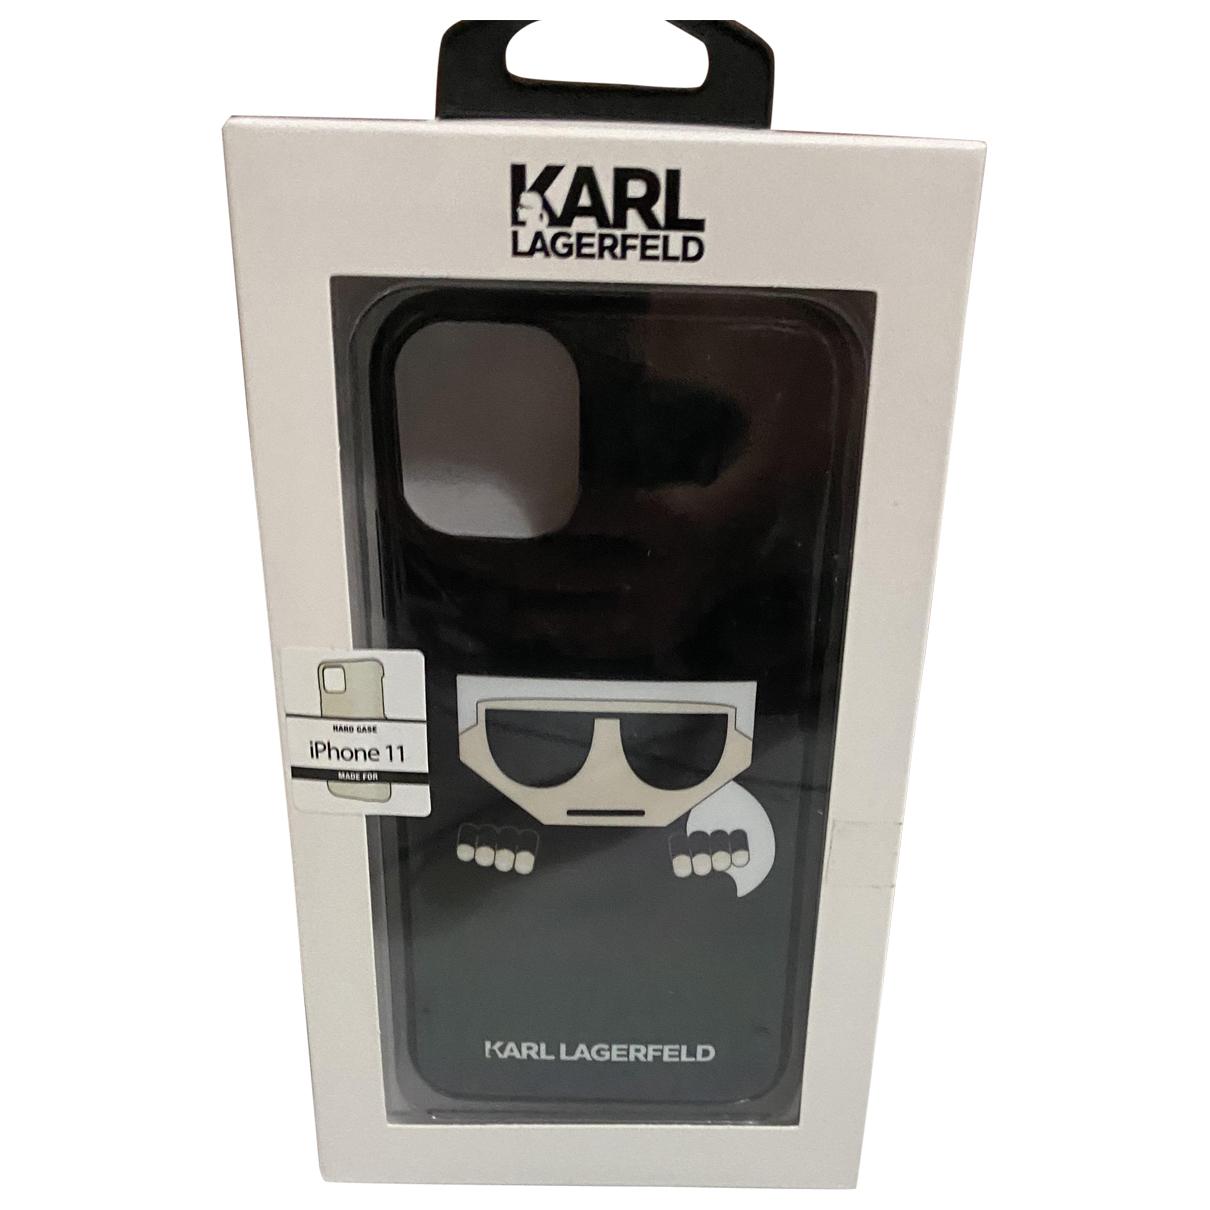 Funda iphone Karl Lagerfeld